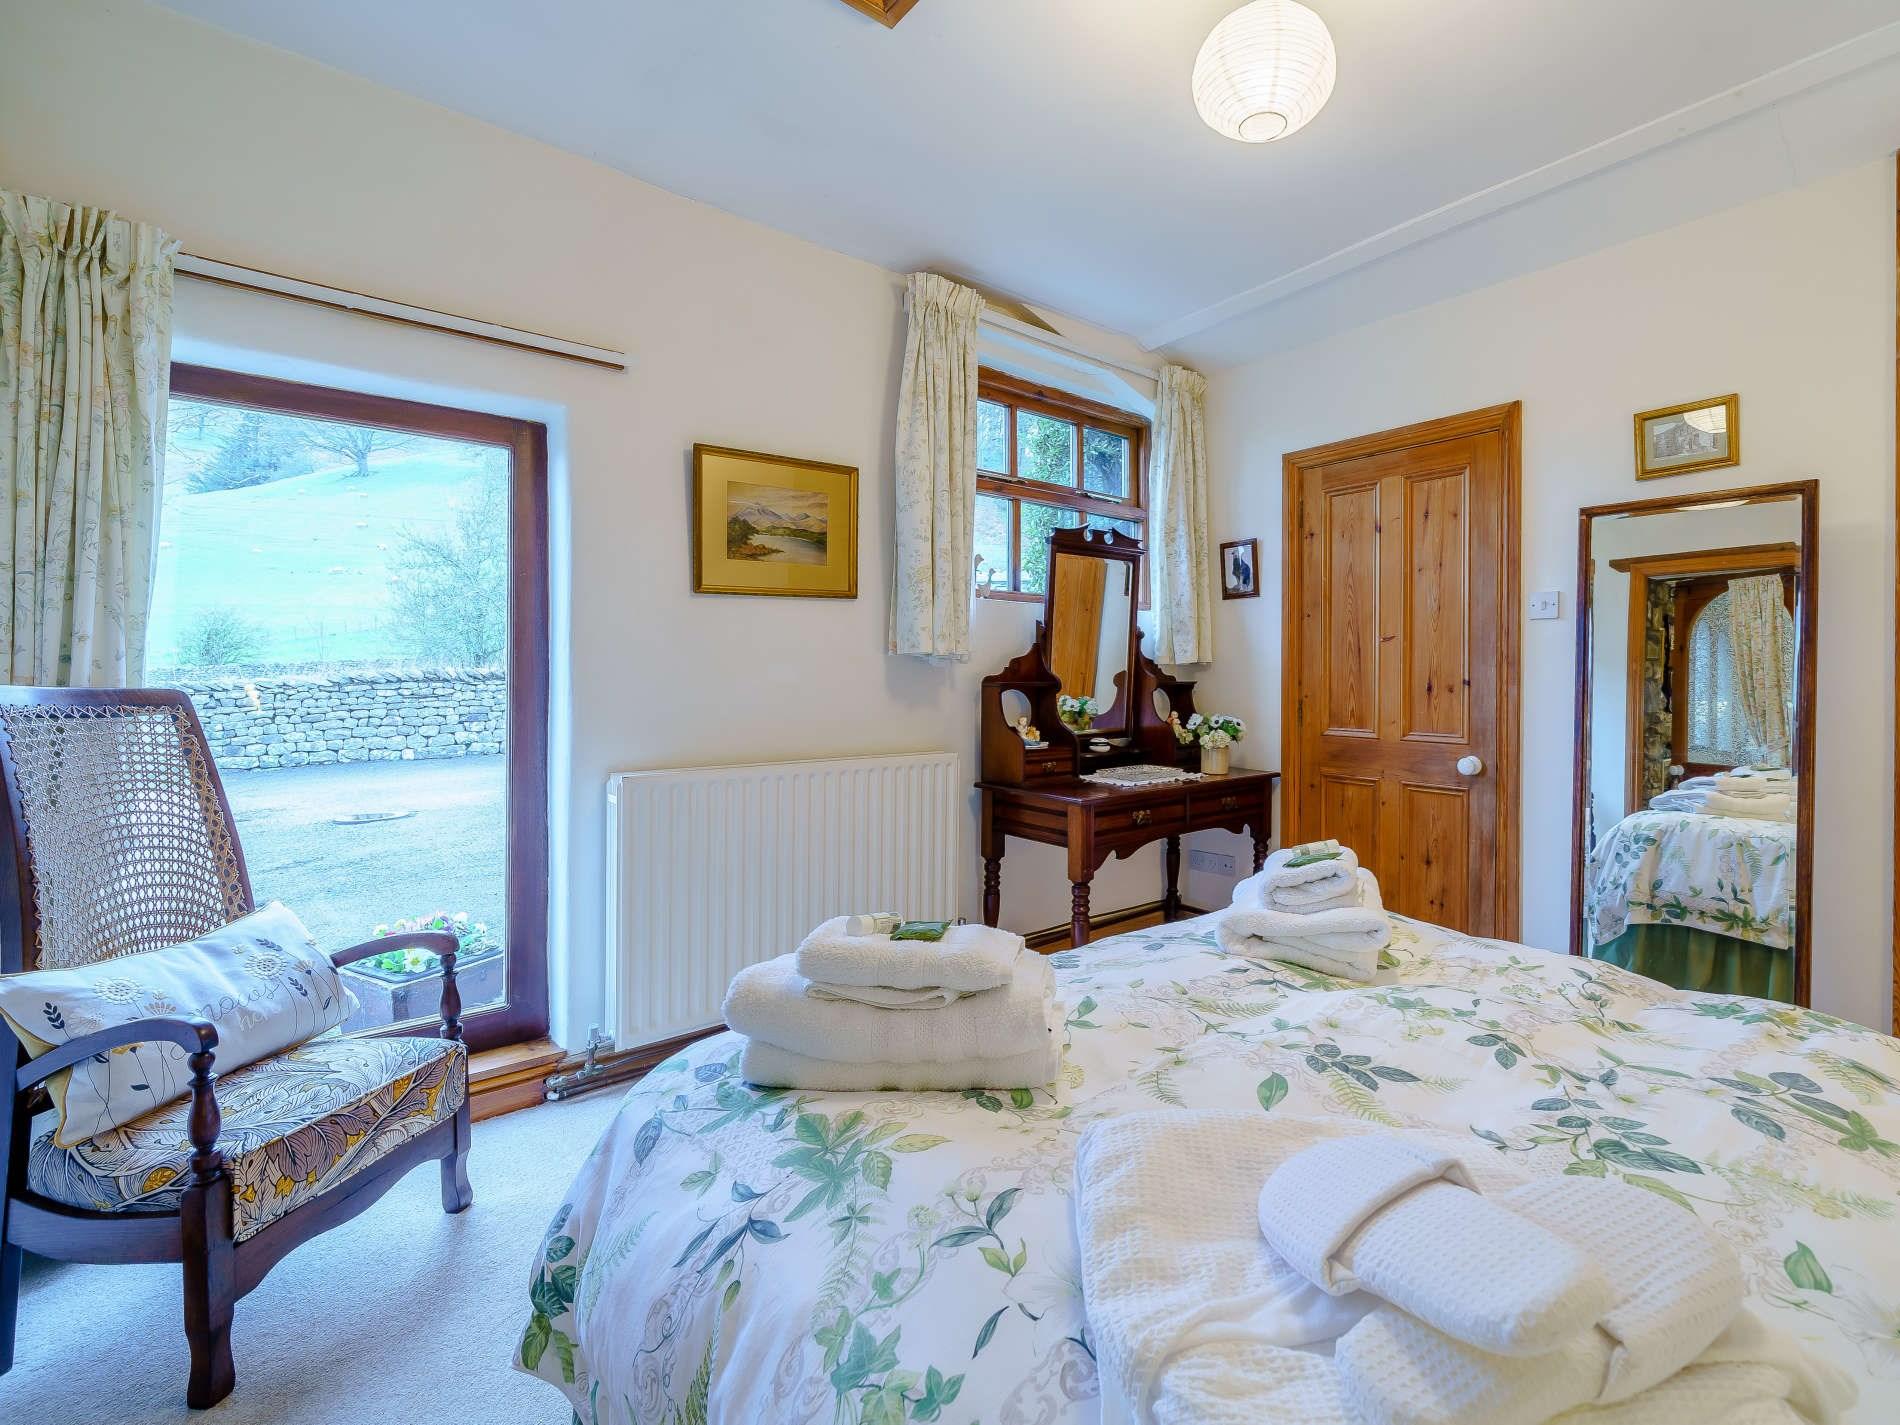 2 Bedroom Cottage in Sedbergh, Scottish Borders